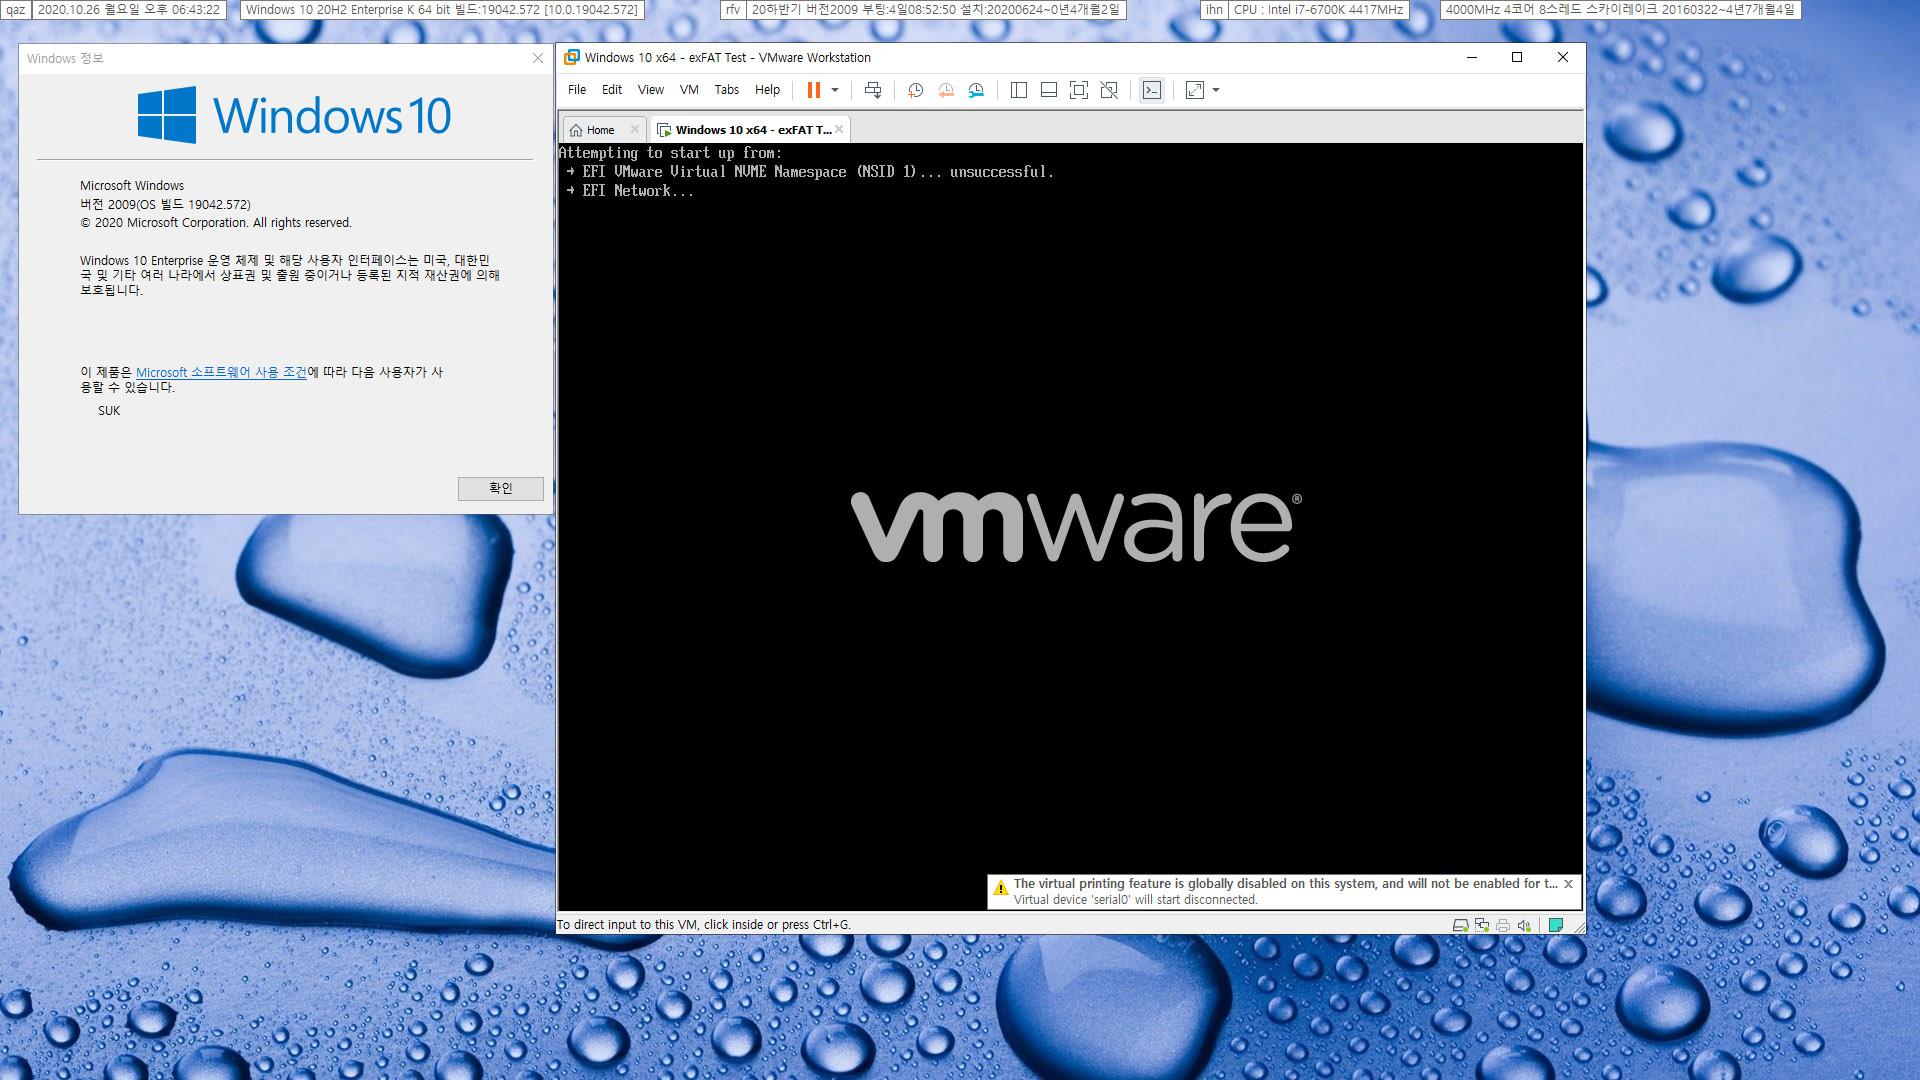 exFAT 포맷으로도 VHD 부팅이 Windows 10 버전 1903부터 된다고 하여 테스트 - 완전 생고생 했습니다 2020-10-26_184322.jpg